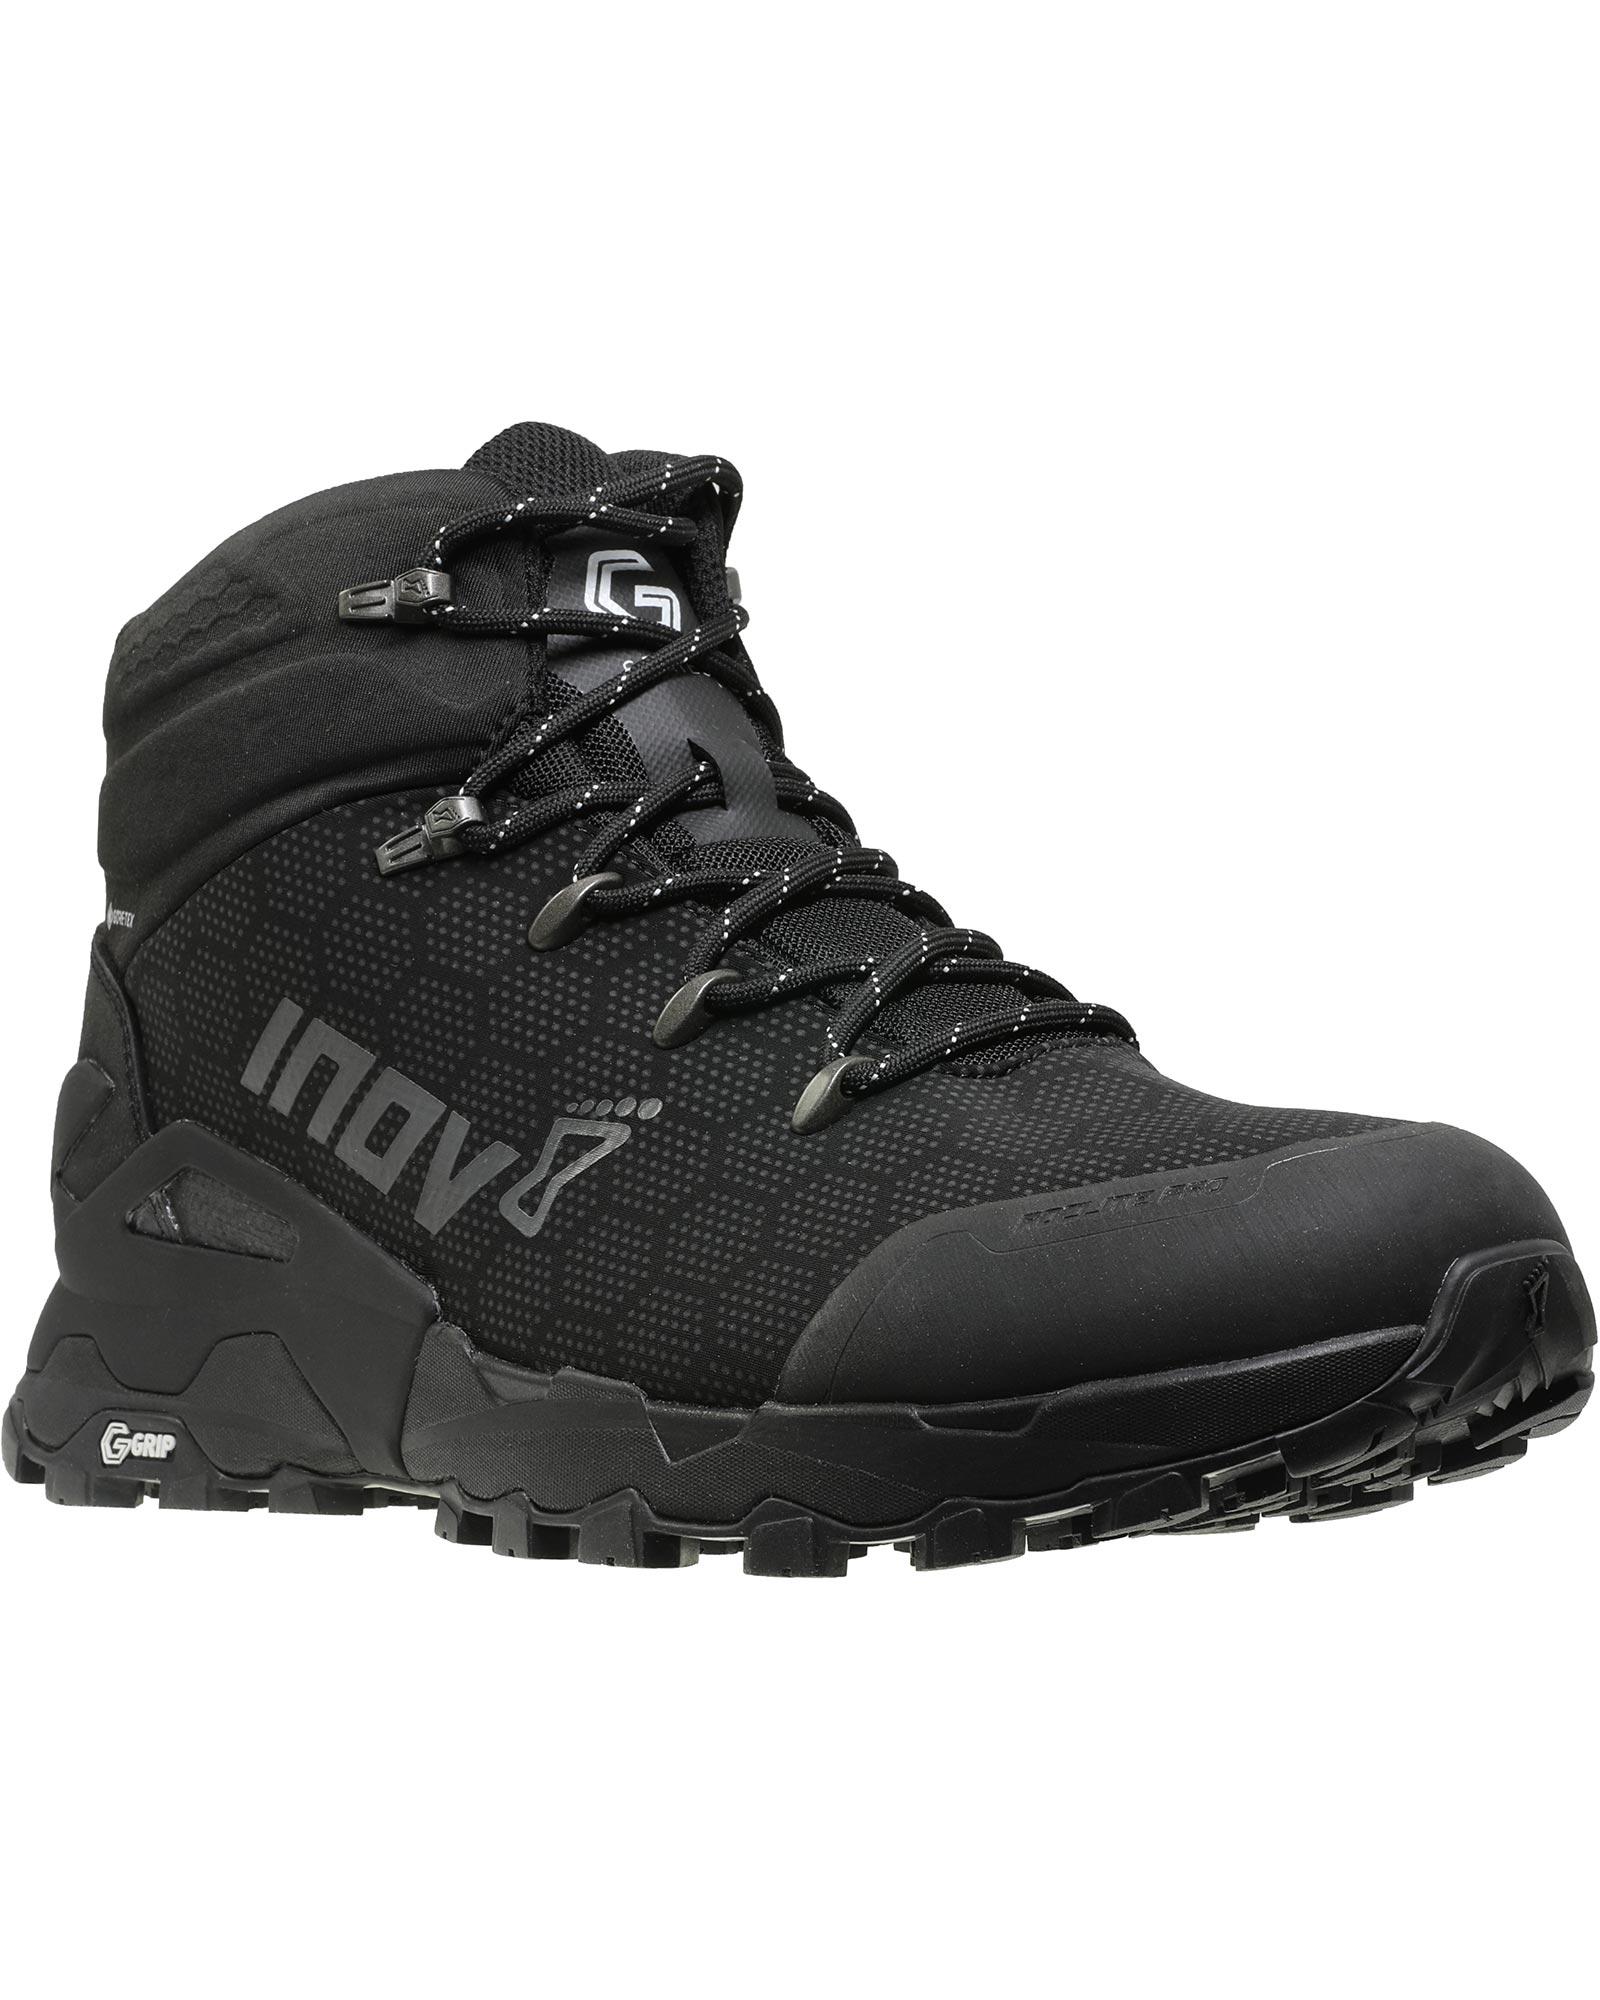 Inov-8 Men's Roclite Pro G 400 GORE-TEX Walking Boots 0